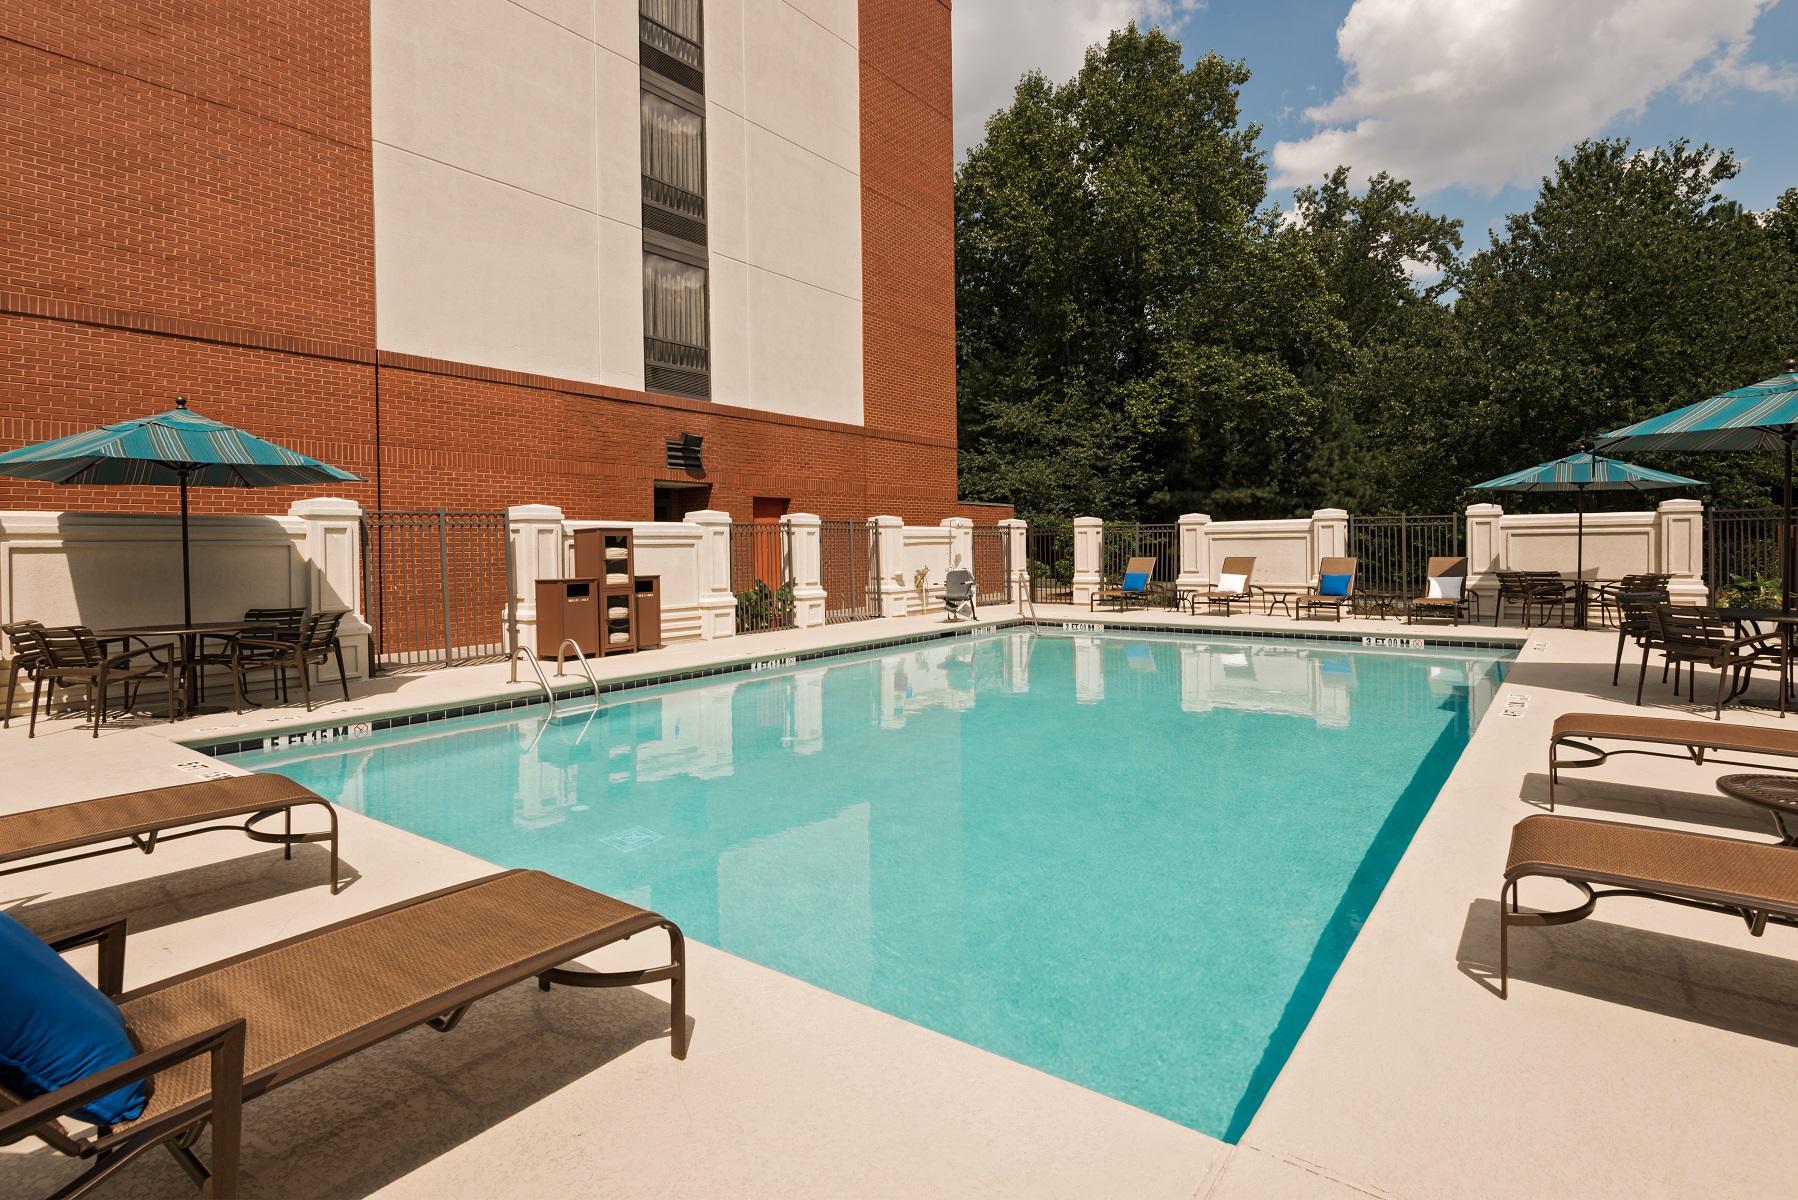 Hyatt Place Atlanta/Duluth/Johns Creek